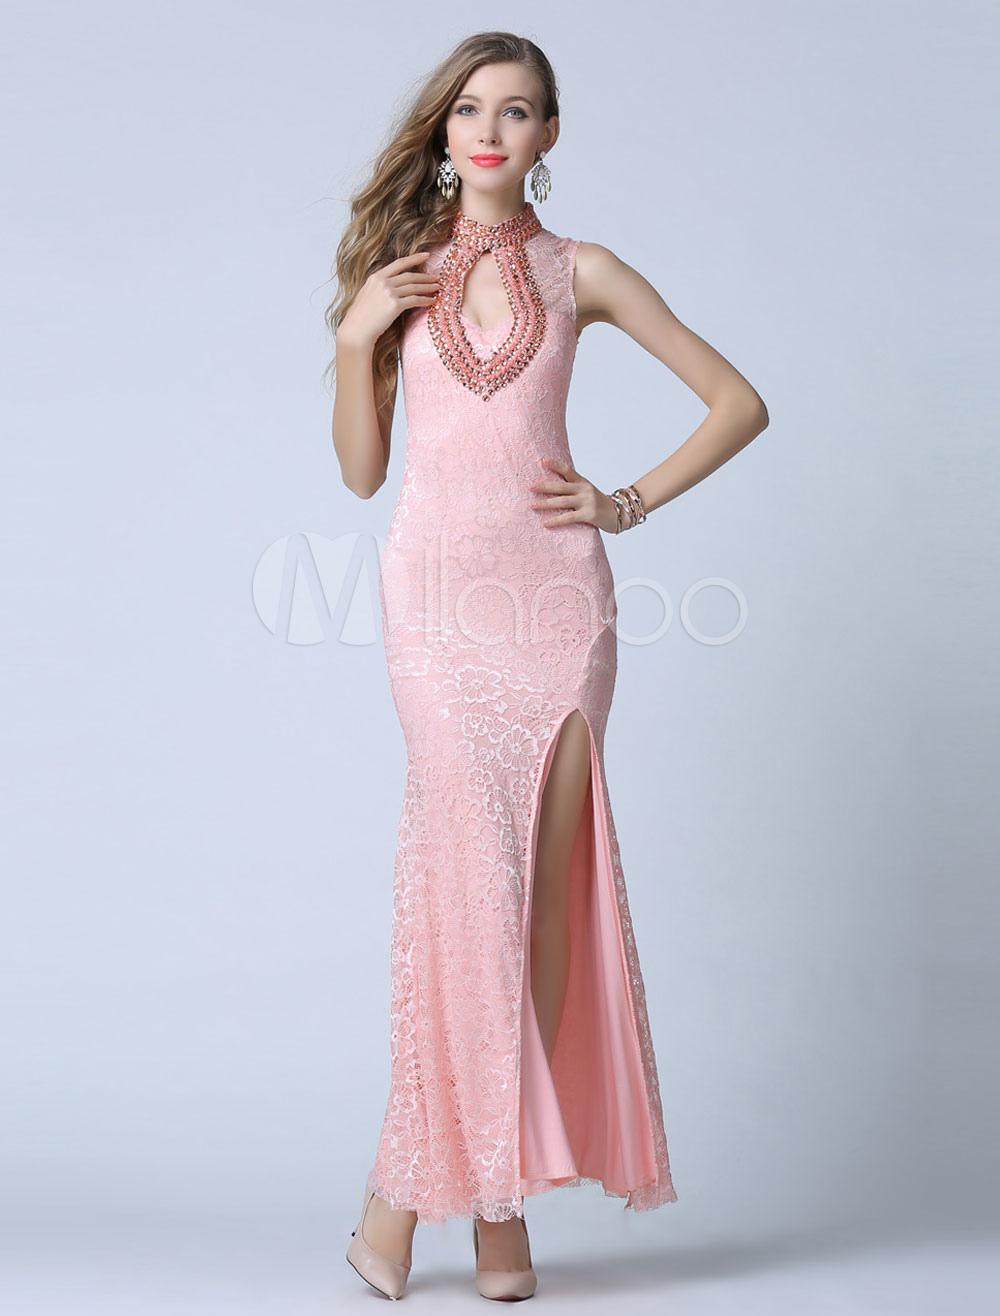 Pink Prom Dress Low-Cut Split Lace Evening Dress (Wedding Cheap Party Dress) photo